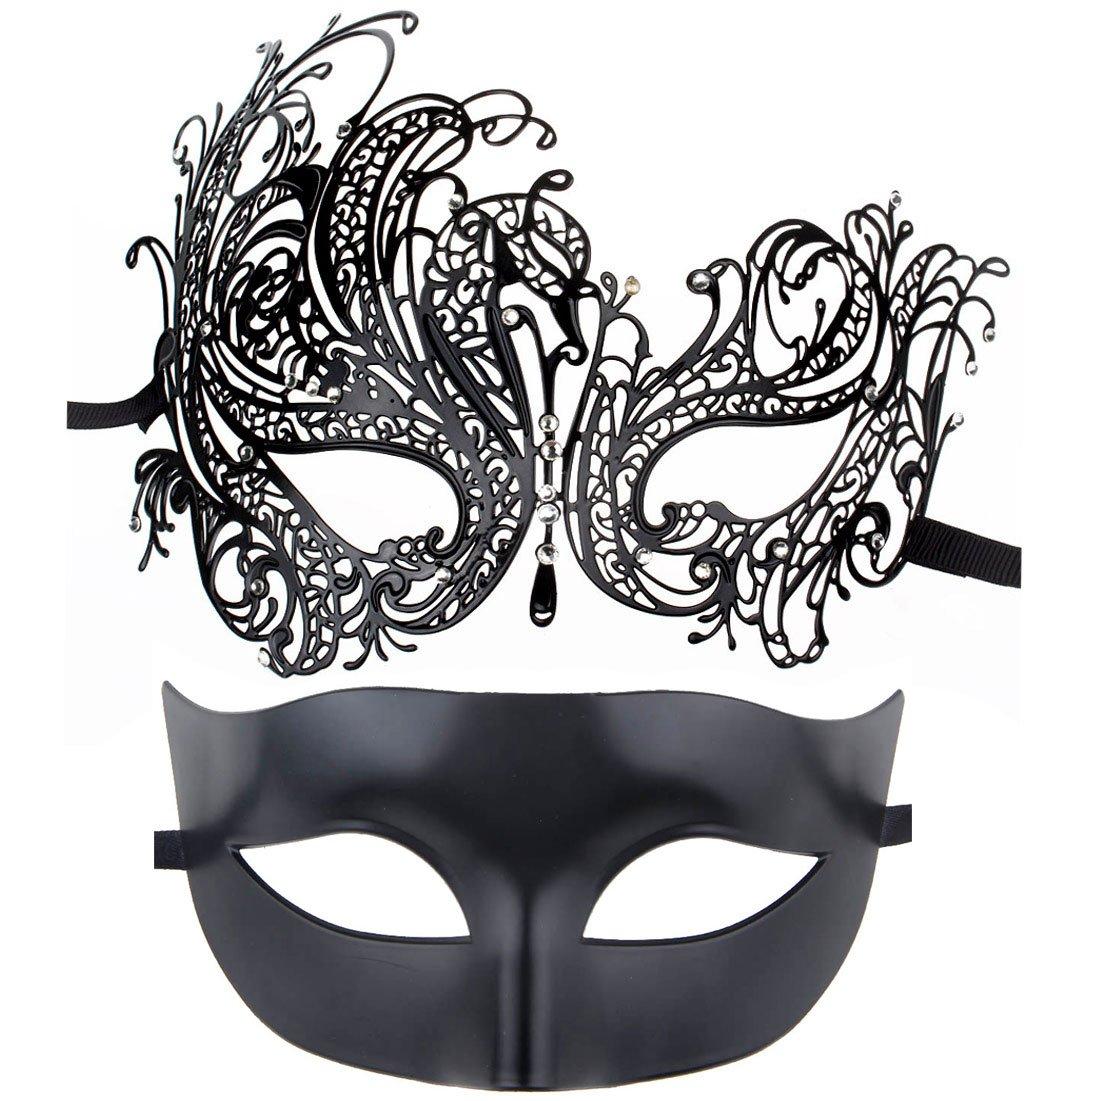 ECOSCO Couple Masquerade Mask Women Men Mardi Gras Venetian Ball Mask (Black+black6)